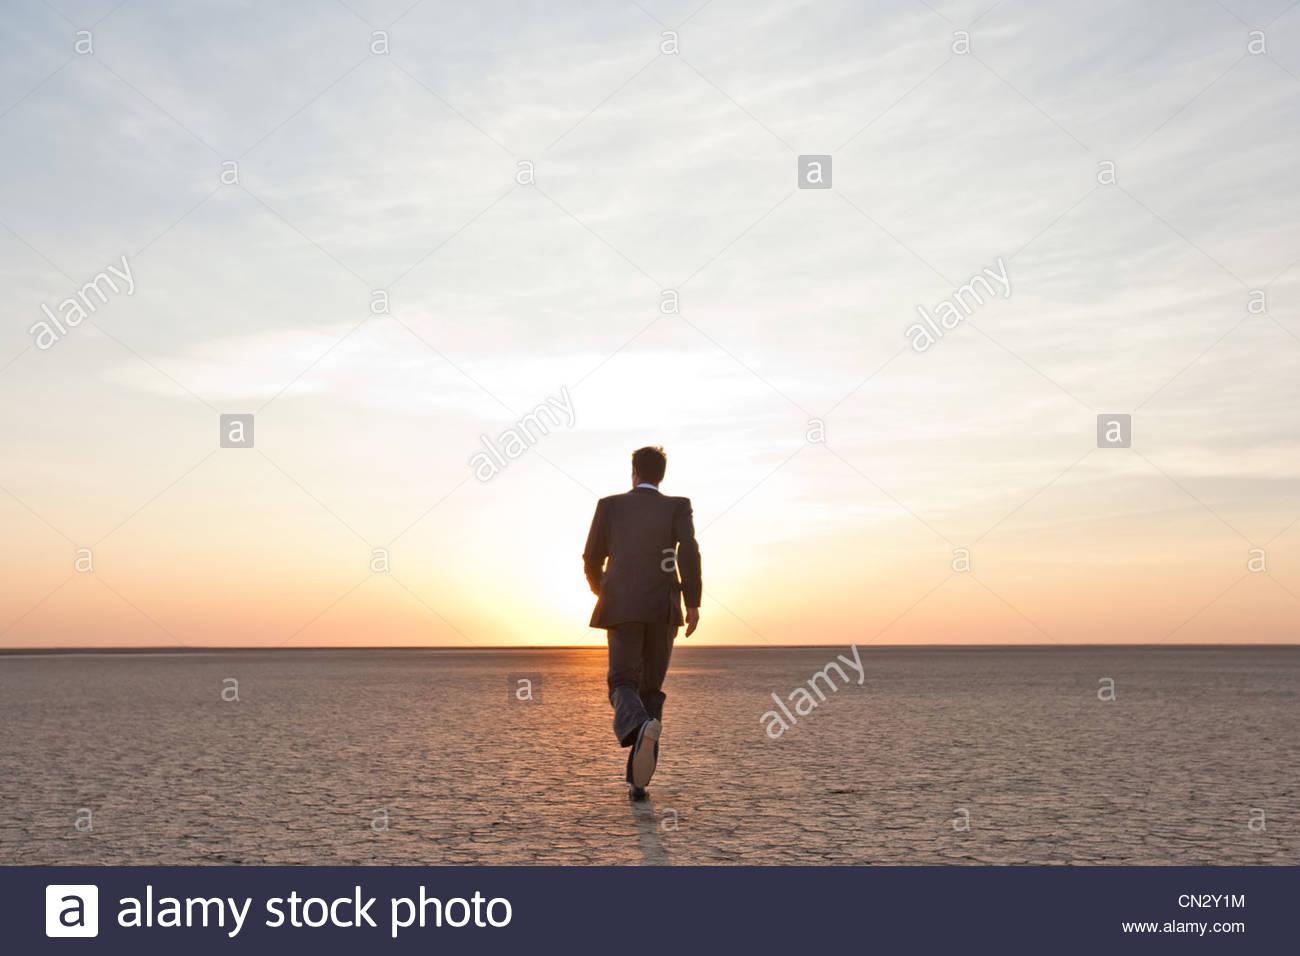 Businessman walking alone in the desert - Stock Image